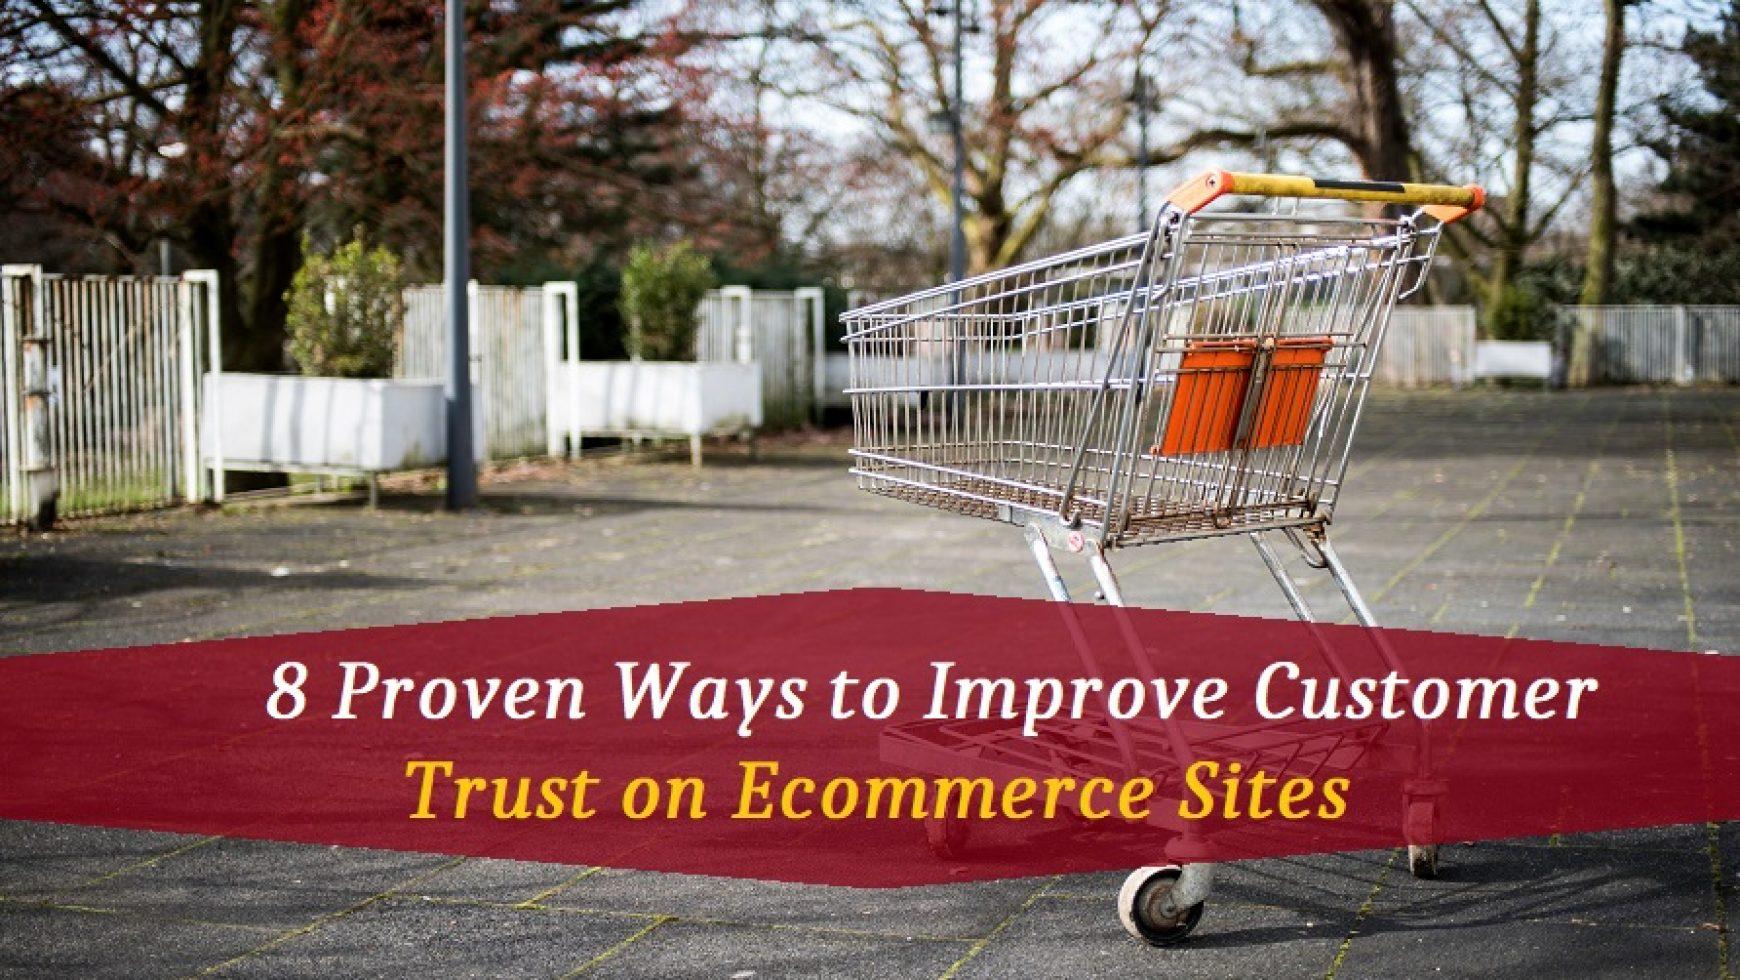 8 Proven Ways to Improve Customer Trust on Ecommerce Sites